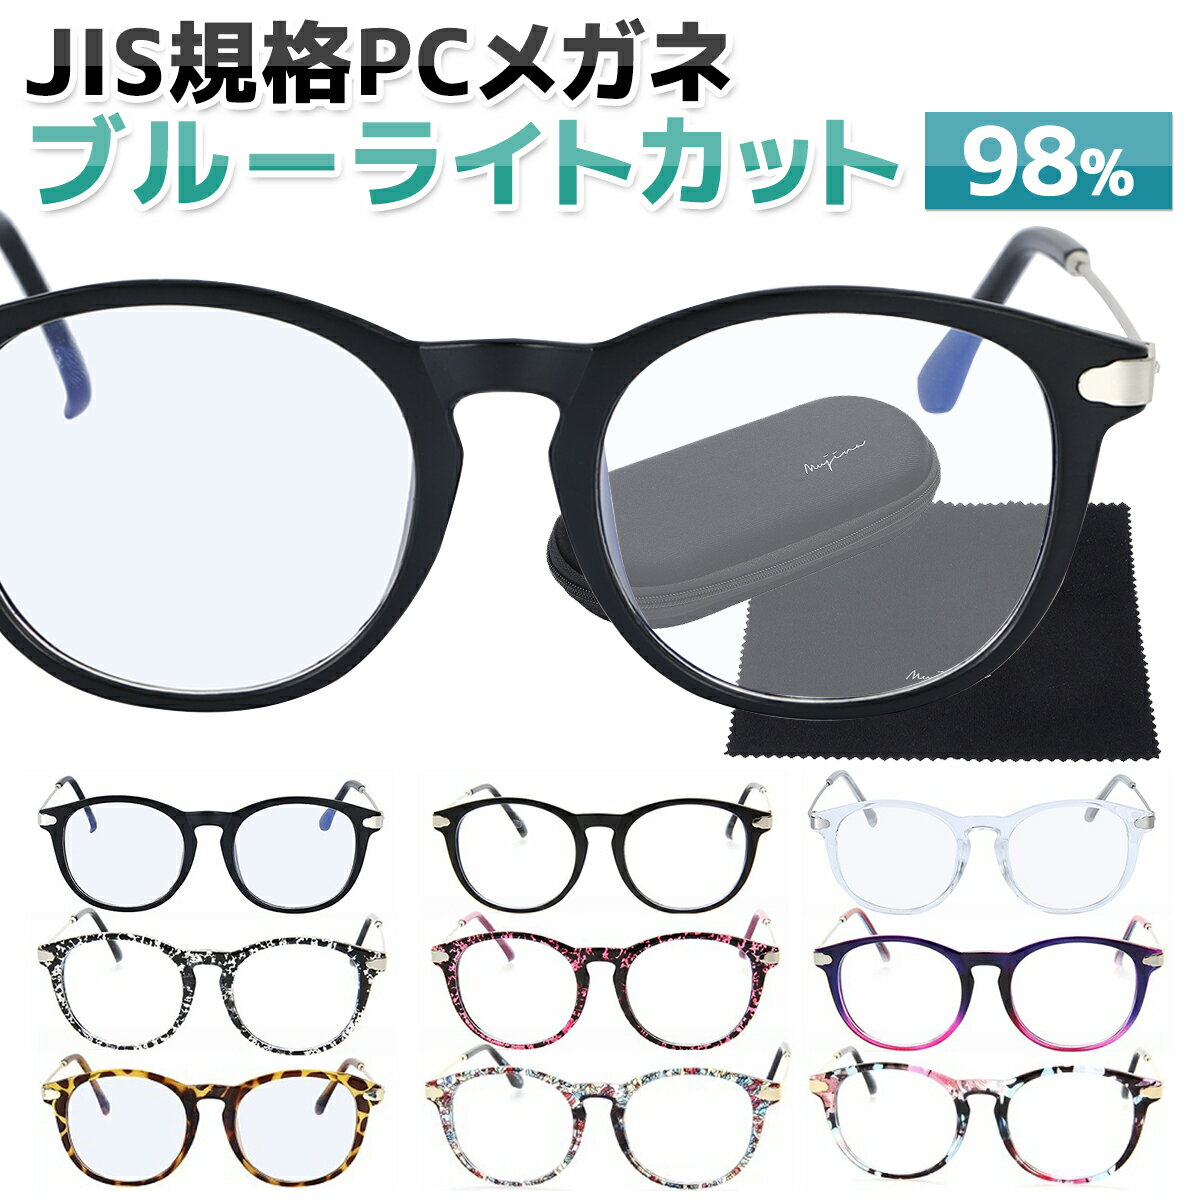 JIS検査済み ブルーライトカット 98%  PC眼鏡